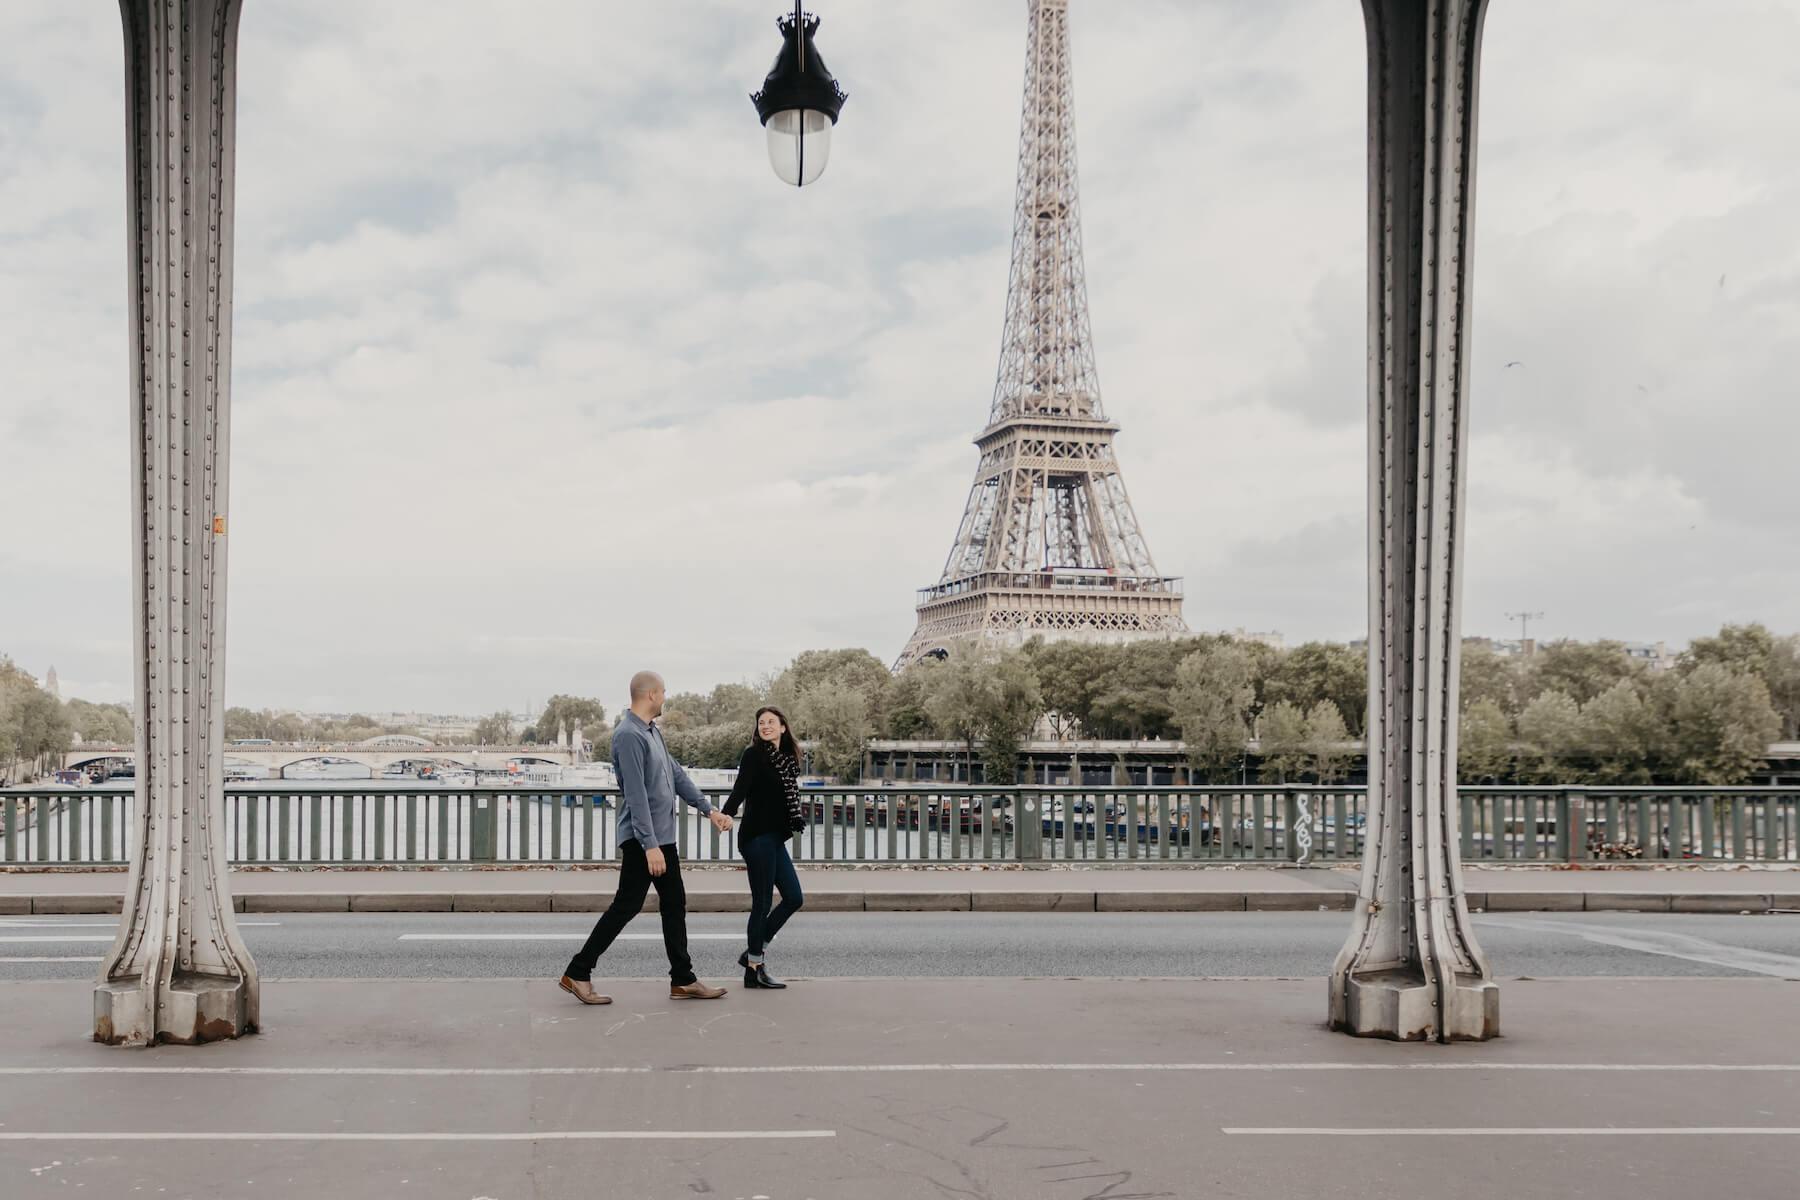 paris-10-06-2019-just-because-9_original